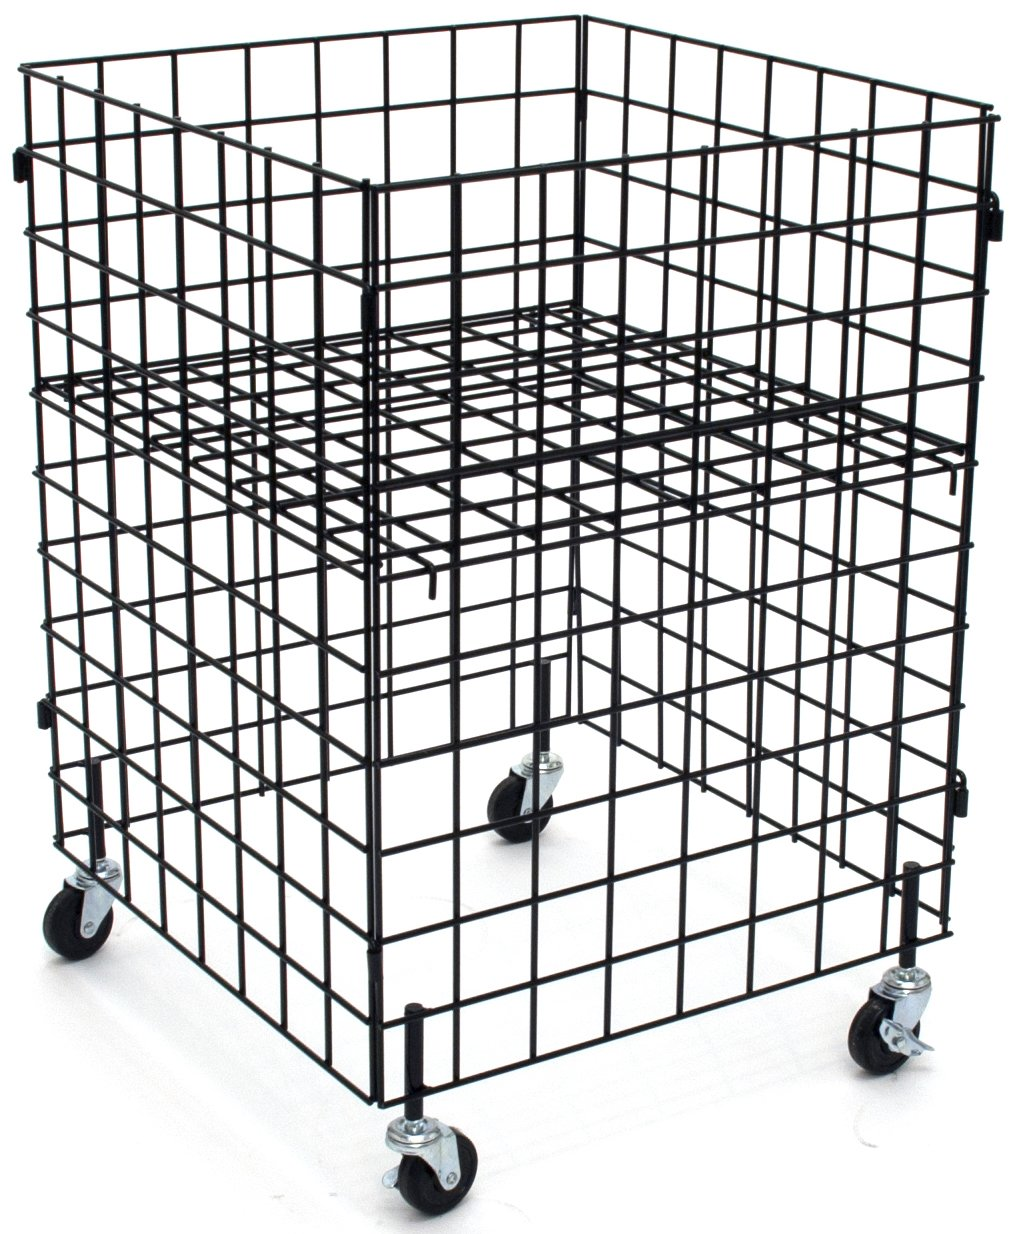 KC Store Fixtures 54106 Grid Dump Bin with Casters, 24'' x 24'' x 34'' High, Black